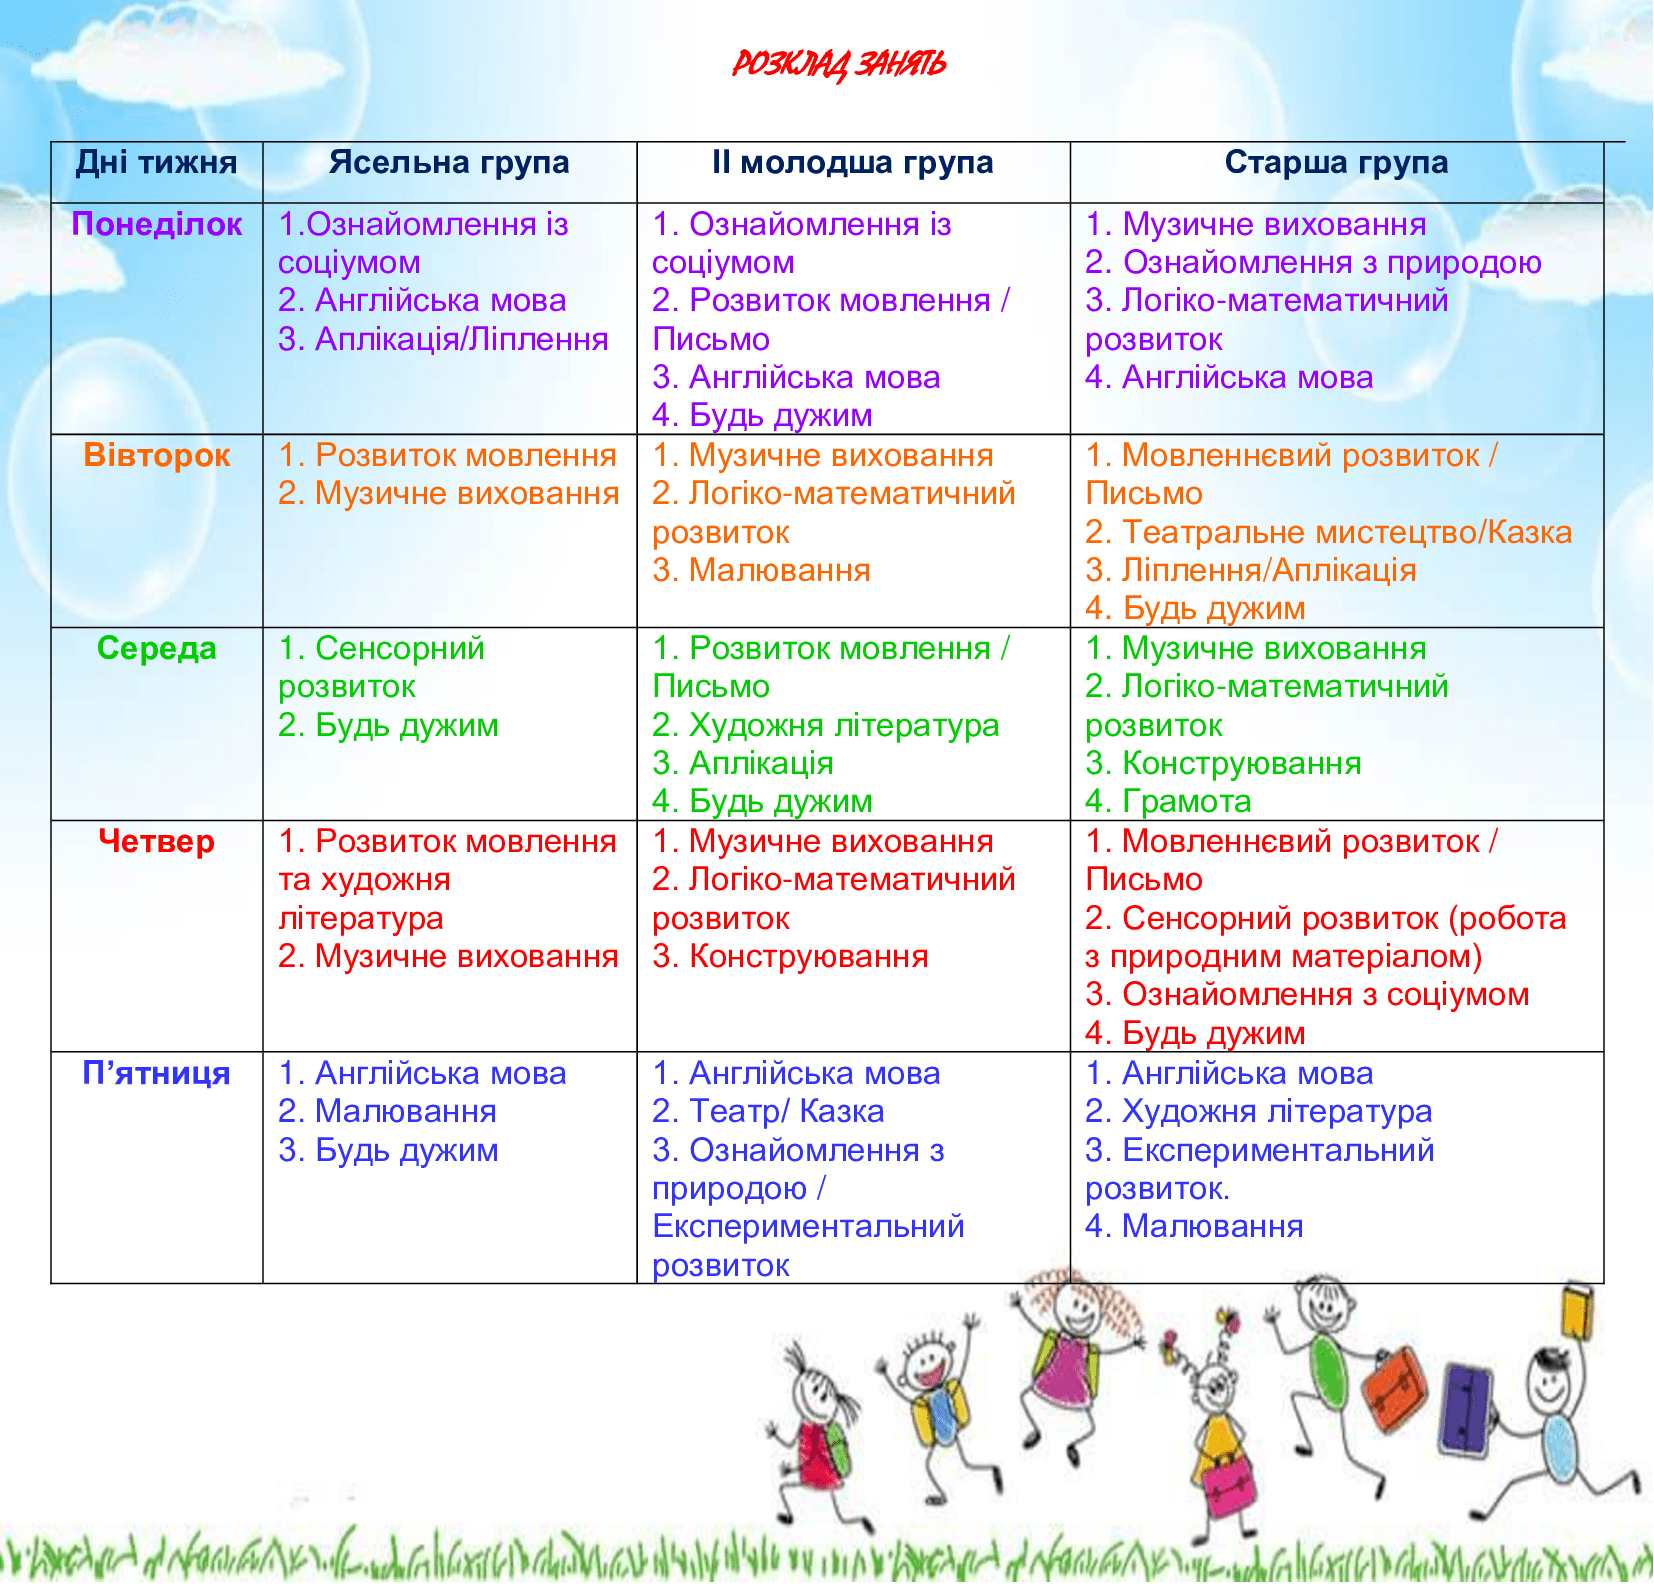 Дитячий садок у Бучі ШКЕТ